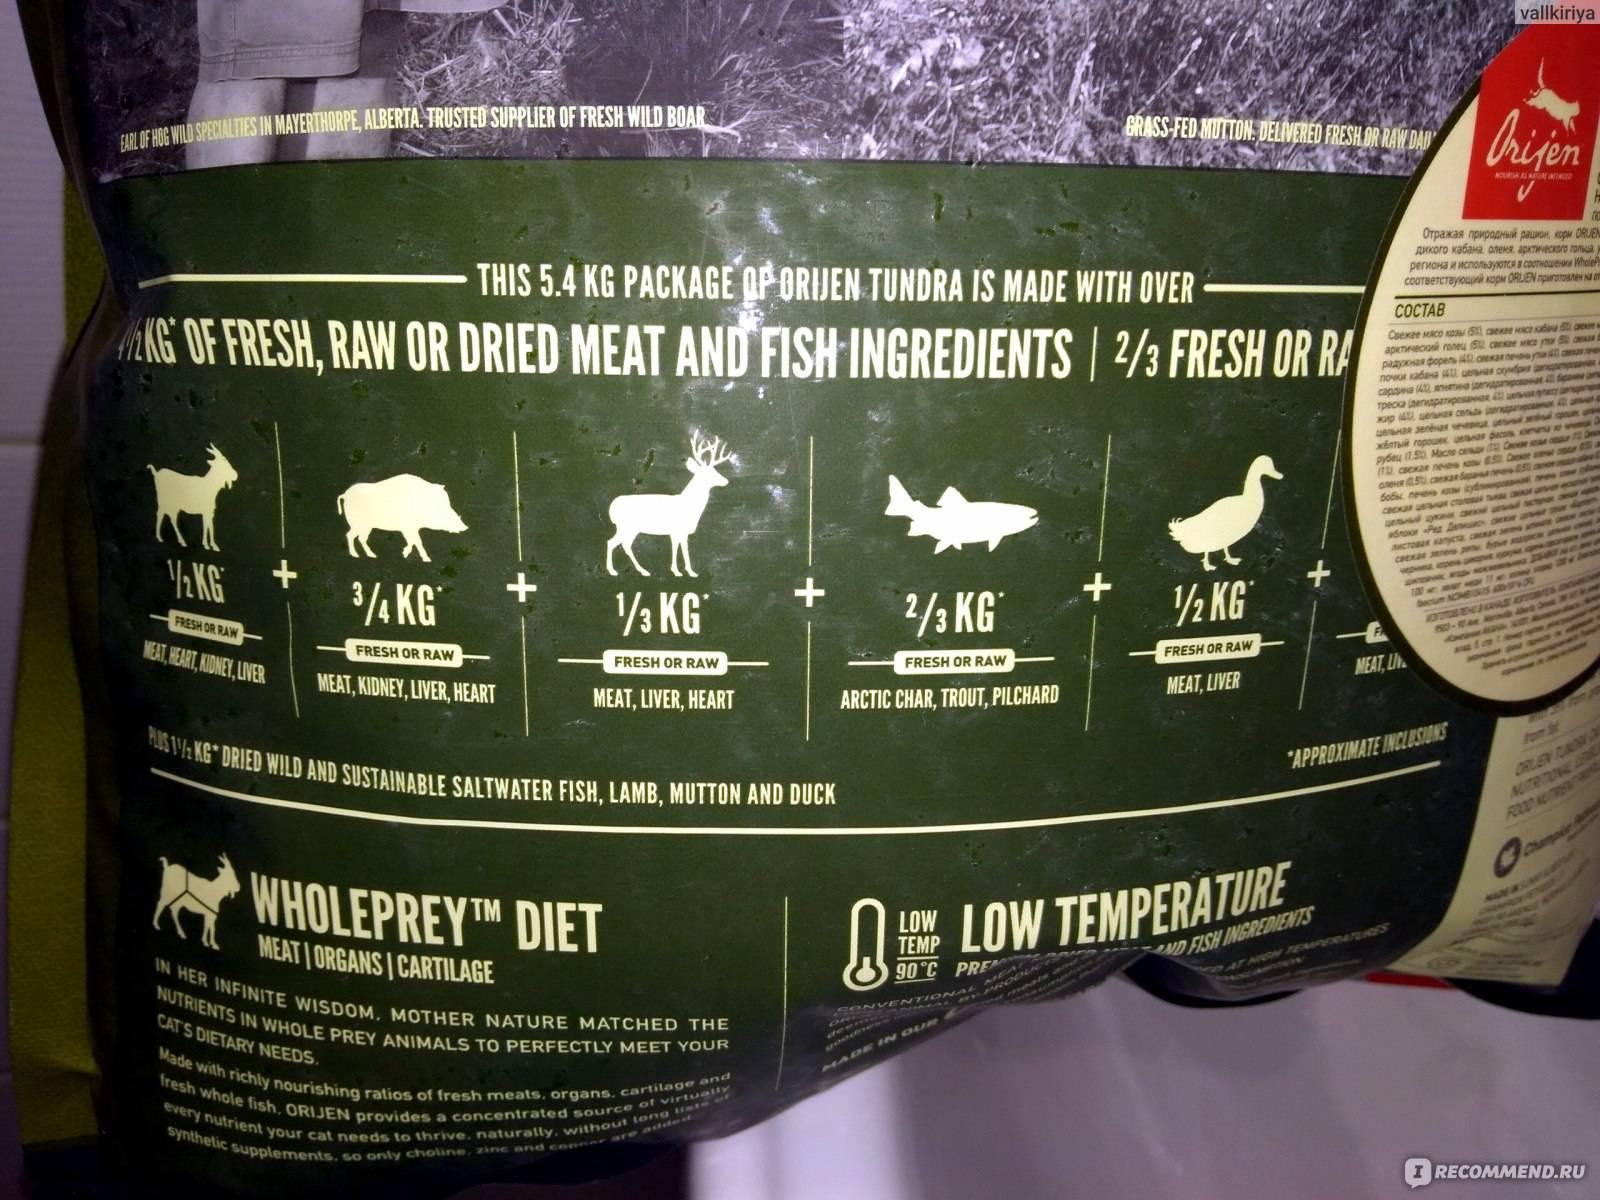 Orijen cat six fish grain free - рейтинг, обзор корма, сравнение и анализ orijen cat six fish grain free, состав и описание корма, плюсы и минусы orijen cat six fish grain free, отзывы о корме, характеристика и дозировка